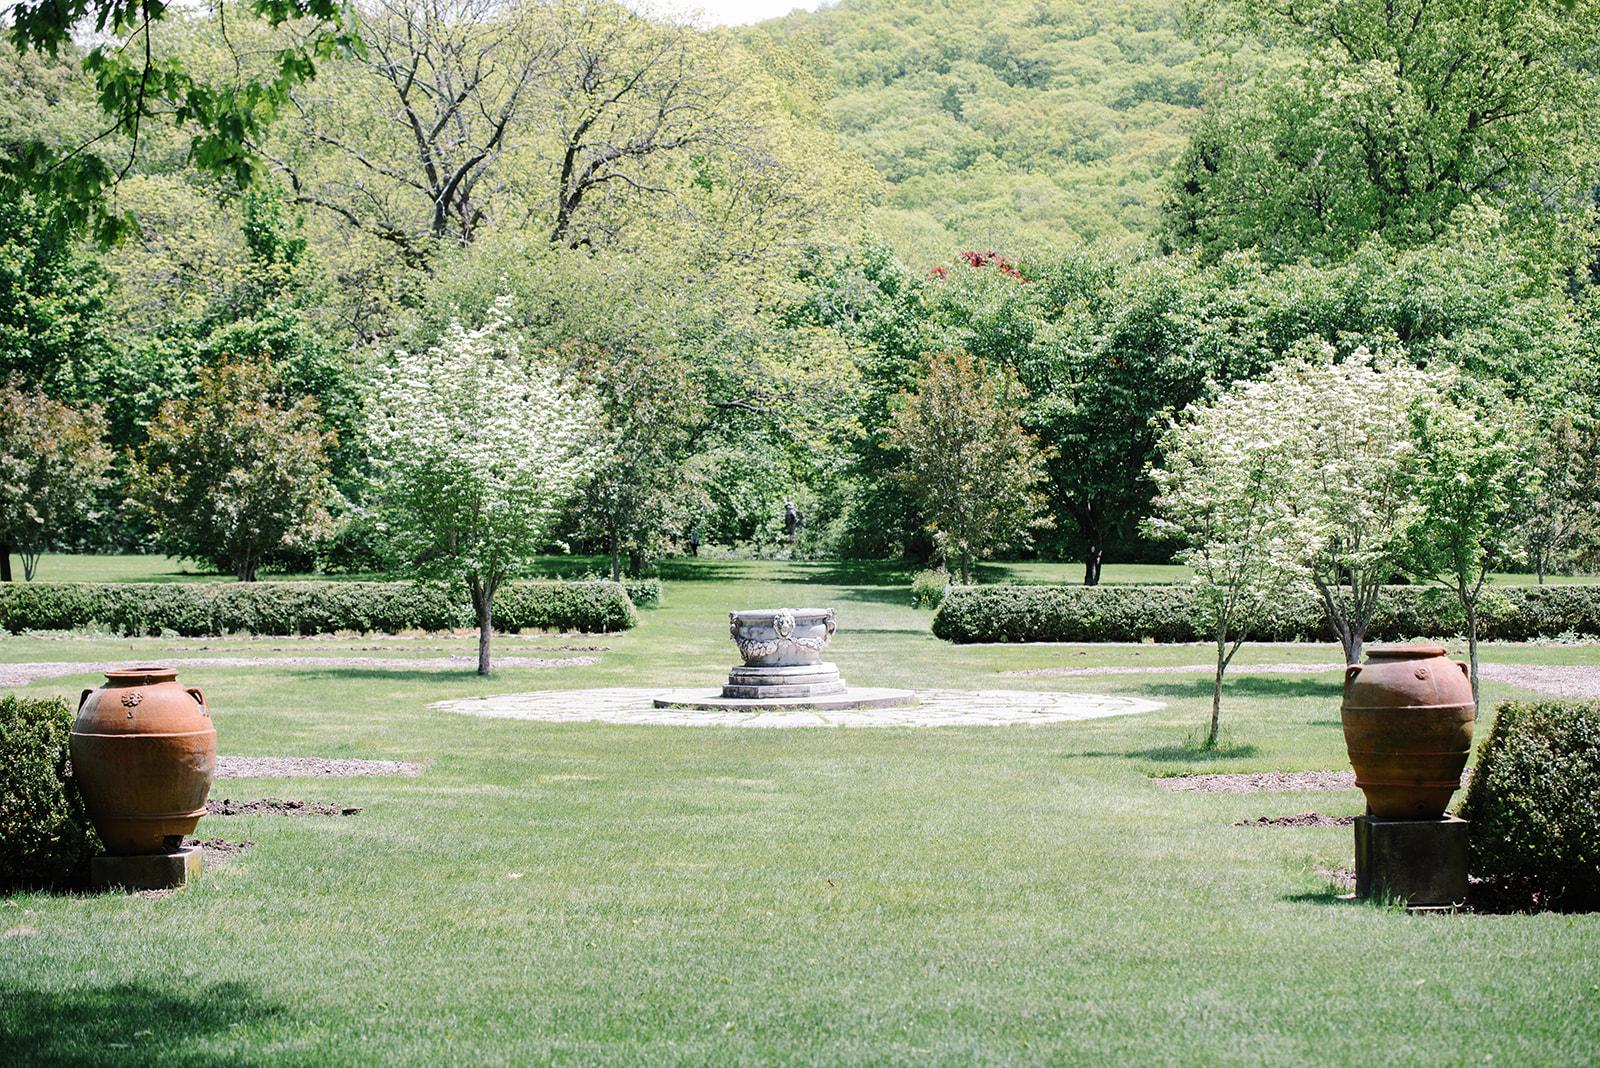 Surprise_Proposal-_NJ_Botanical_Gardens-_Greg_and_Jackie-New_Jersey-_Olivia_Christina_Photo-2.jpg